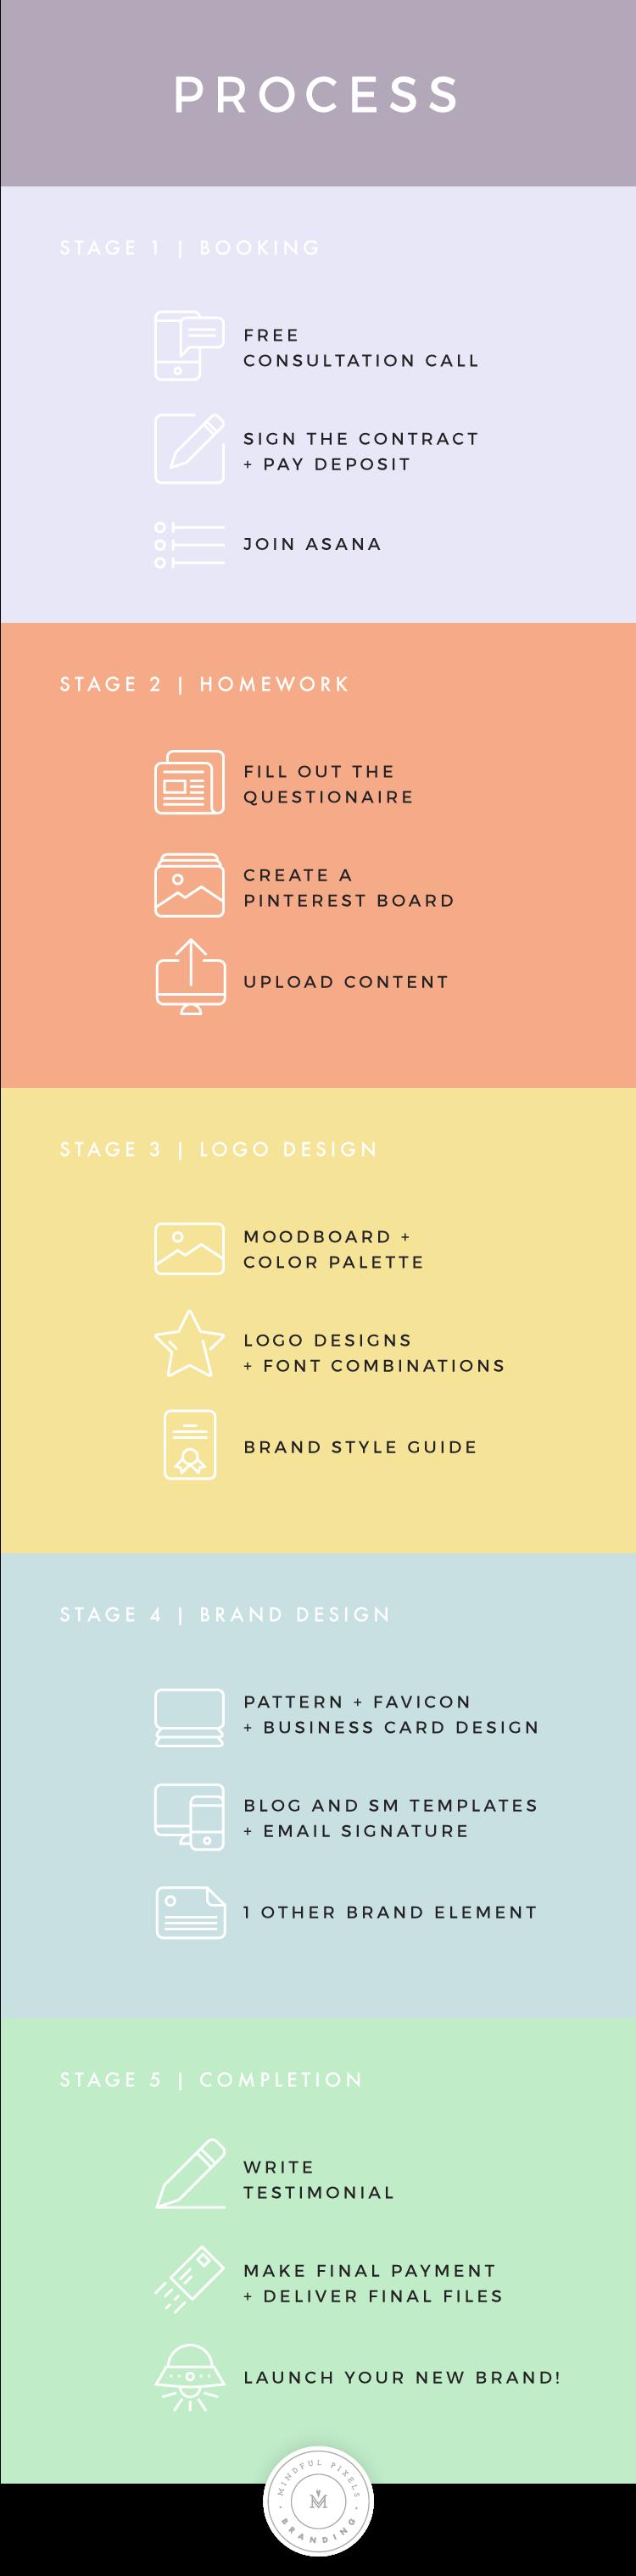 Branding-Process-June2018-1.png